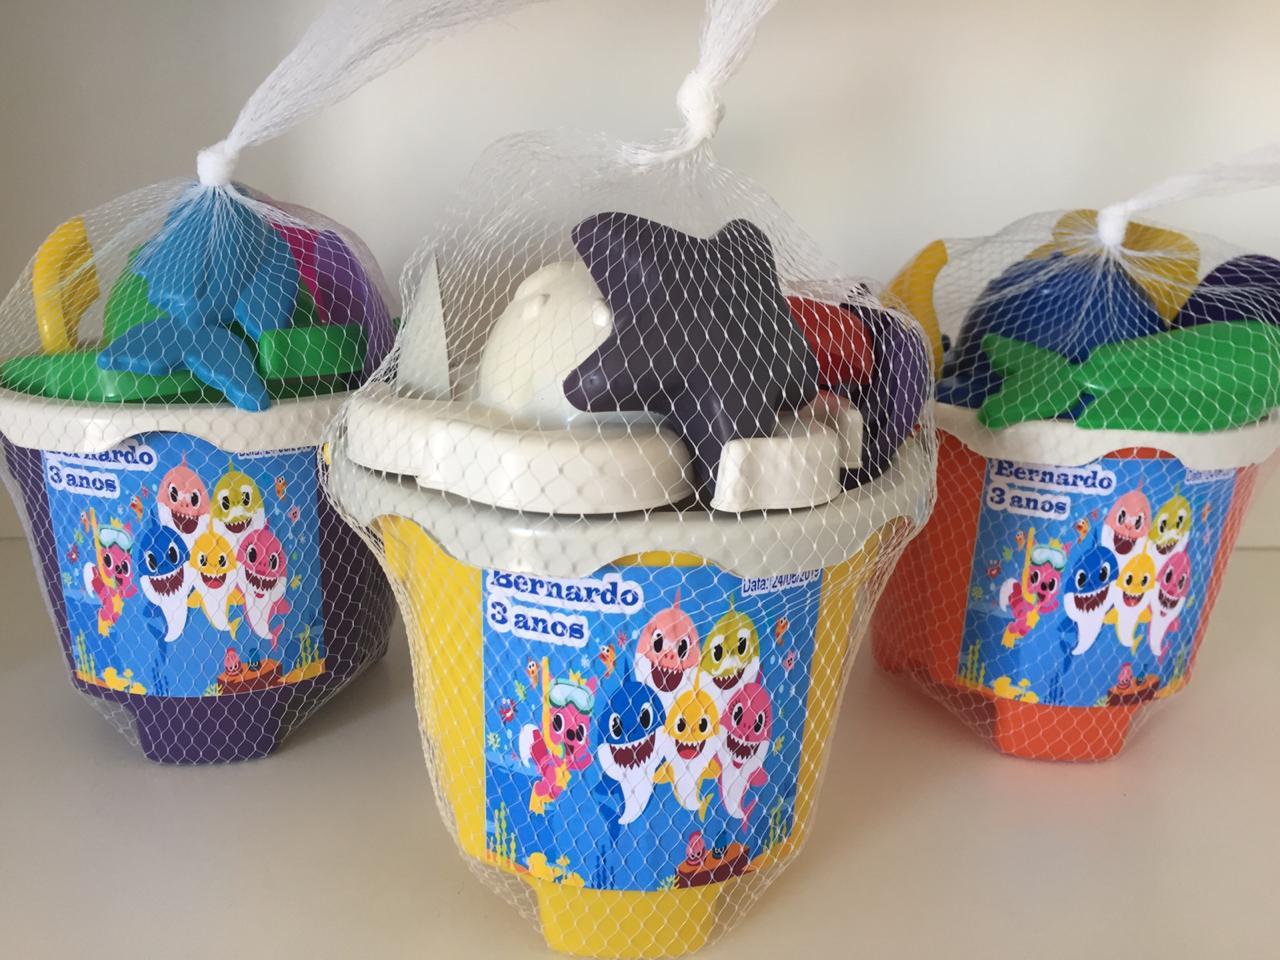 Kit com 20 baldes de praia Baby Shark